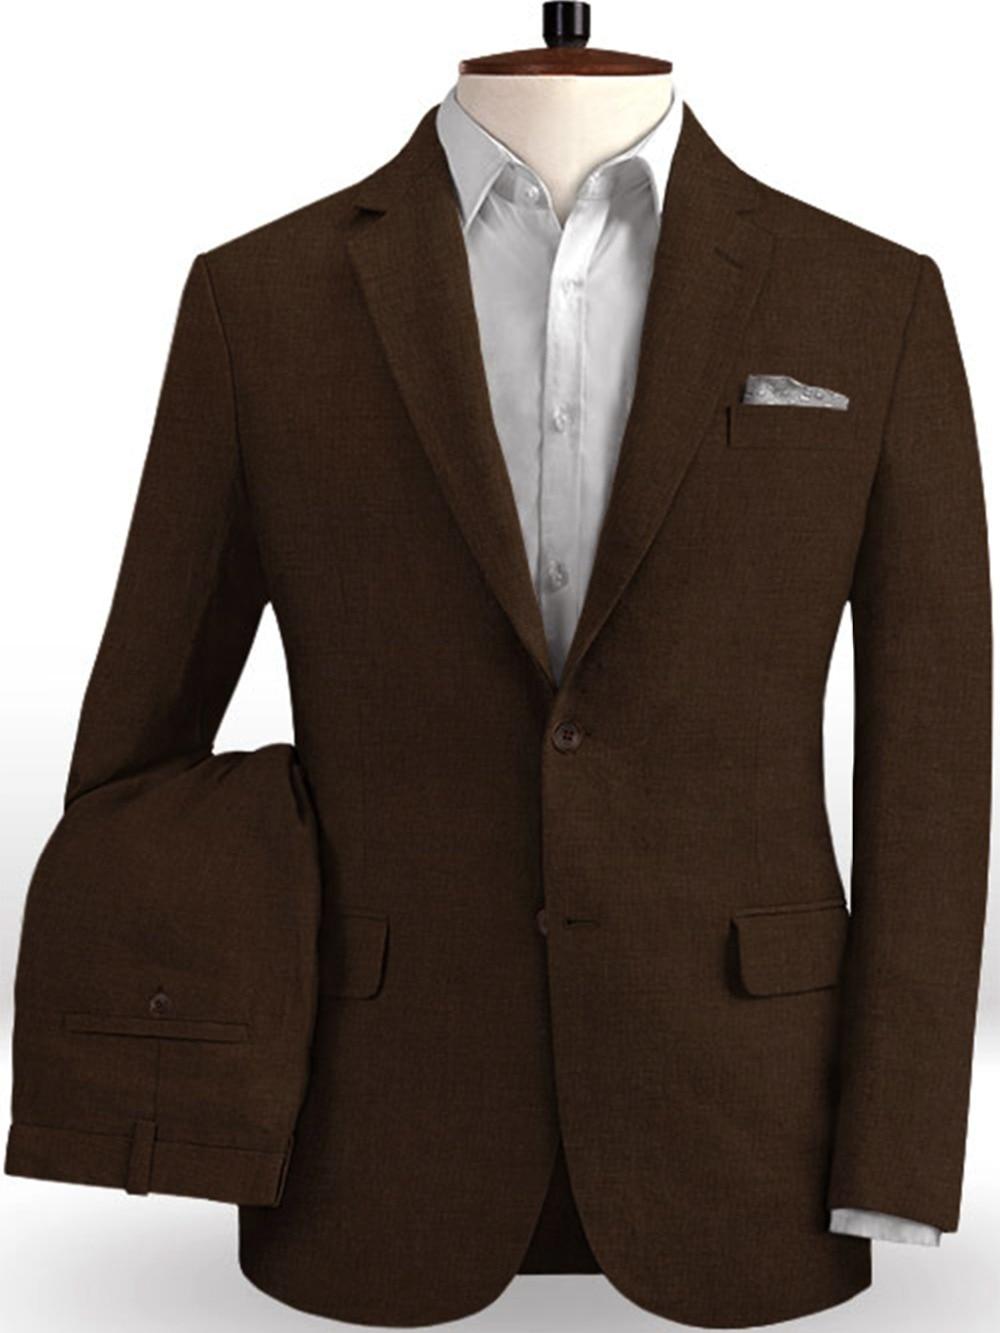 Brown Linen Cotton Suits Men Summer Tuxedo Simple Beach Jacket Custom 2 Piece